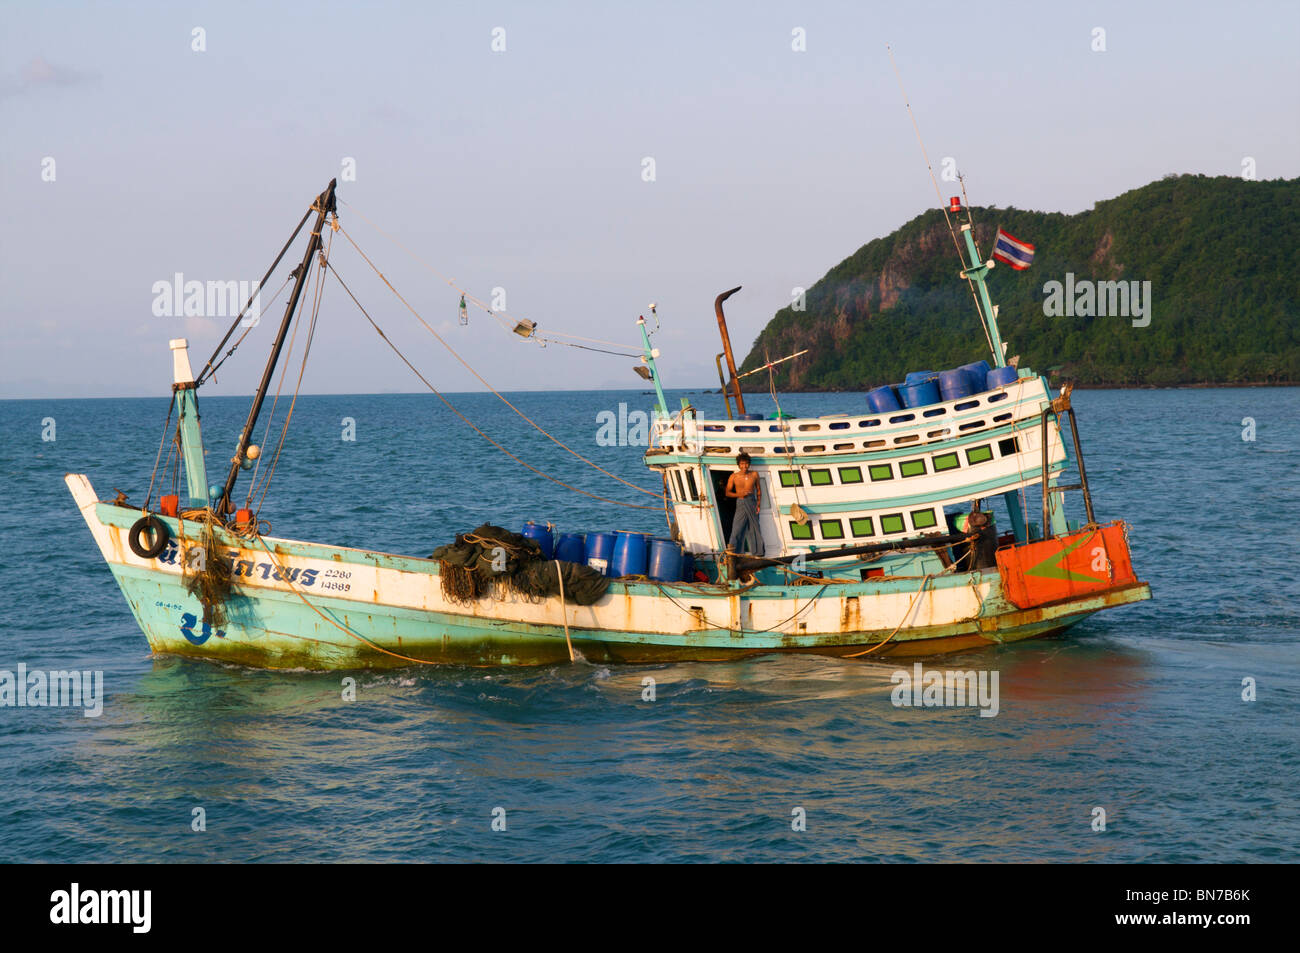 Bateau de pêche thaïlandais Koh Phangan Photo Stock